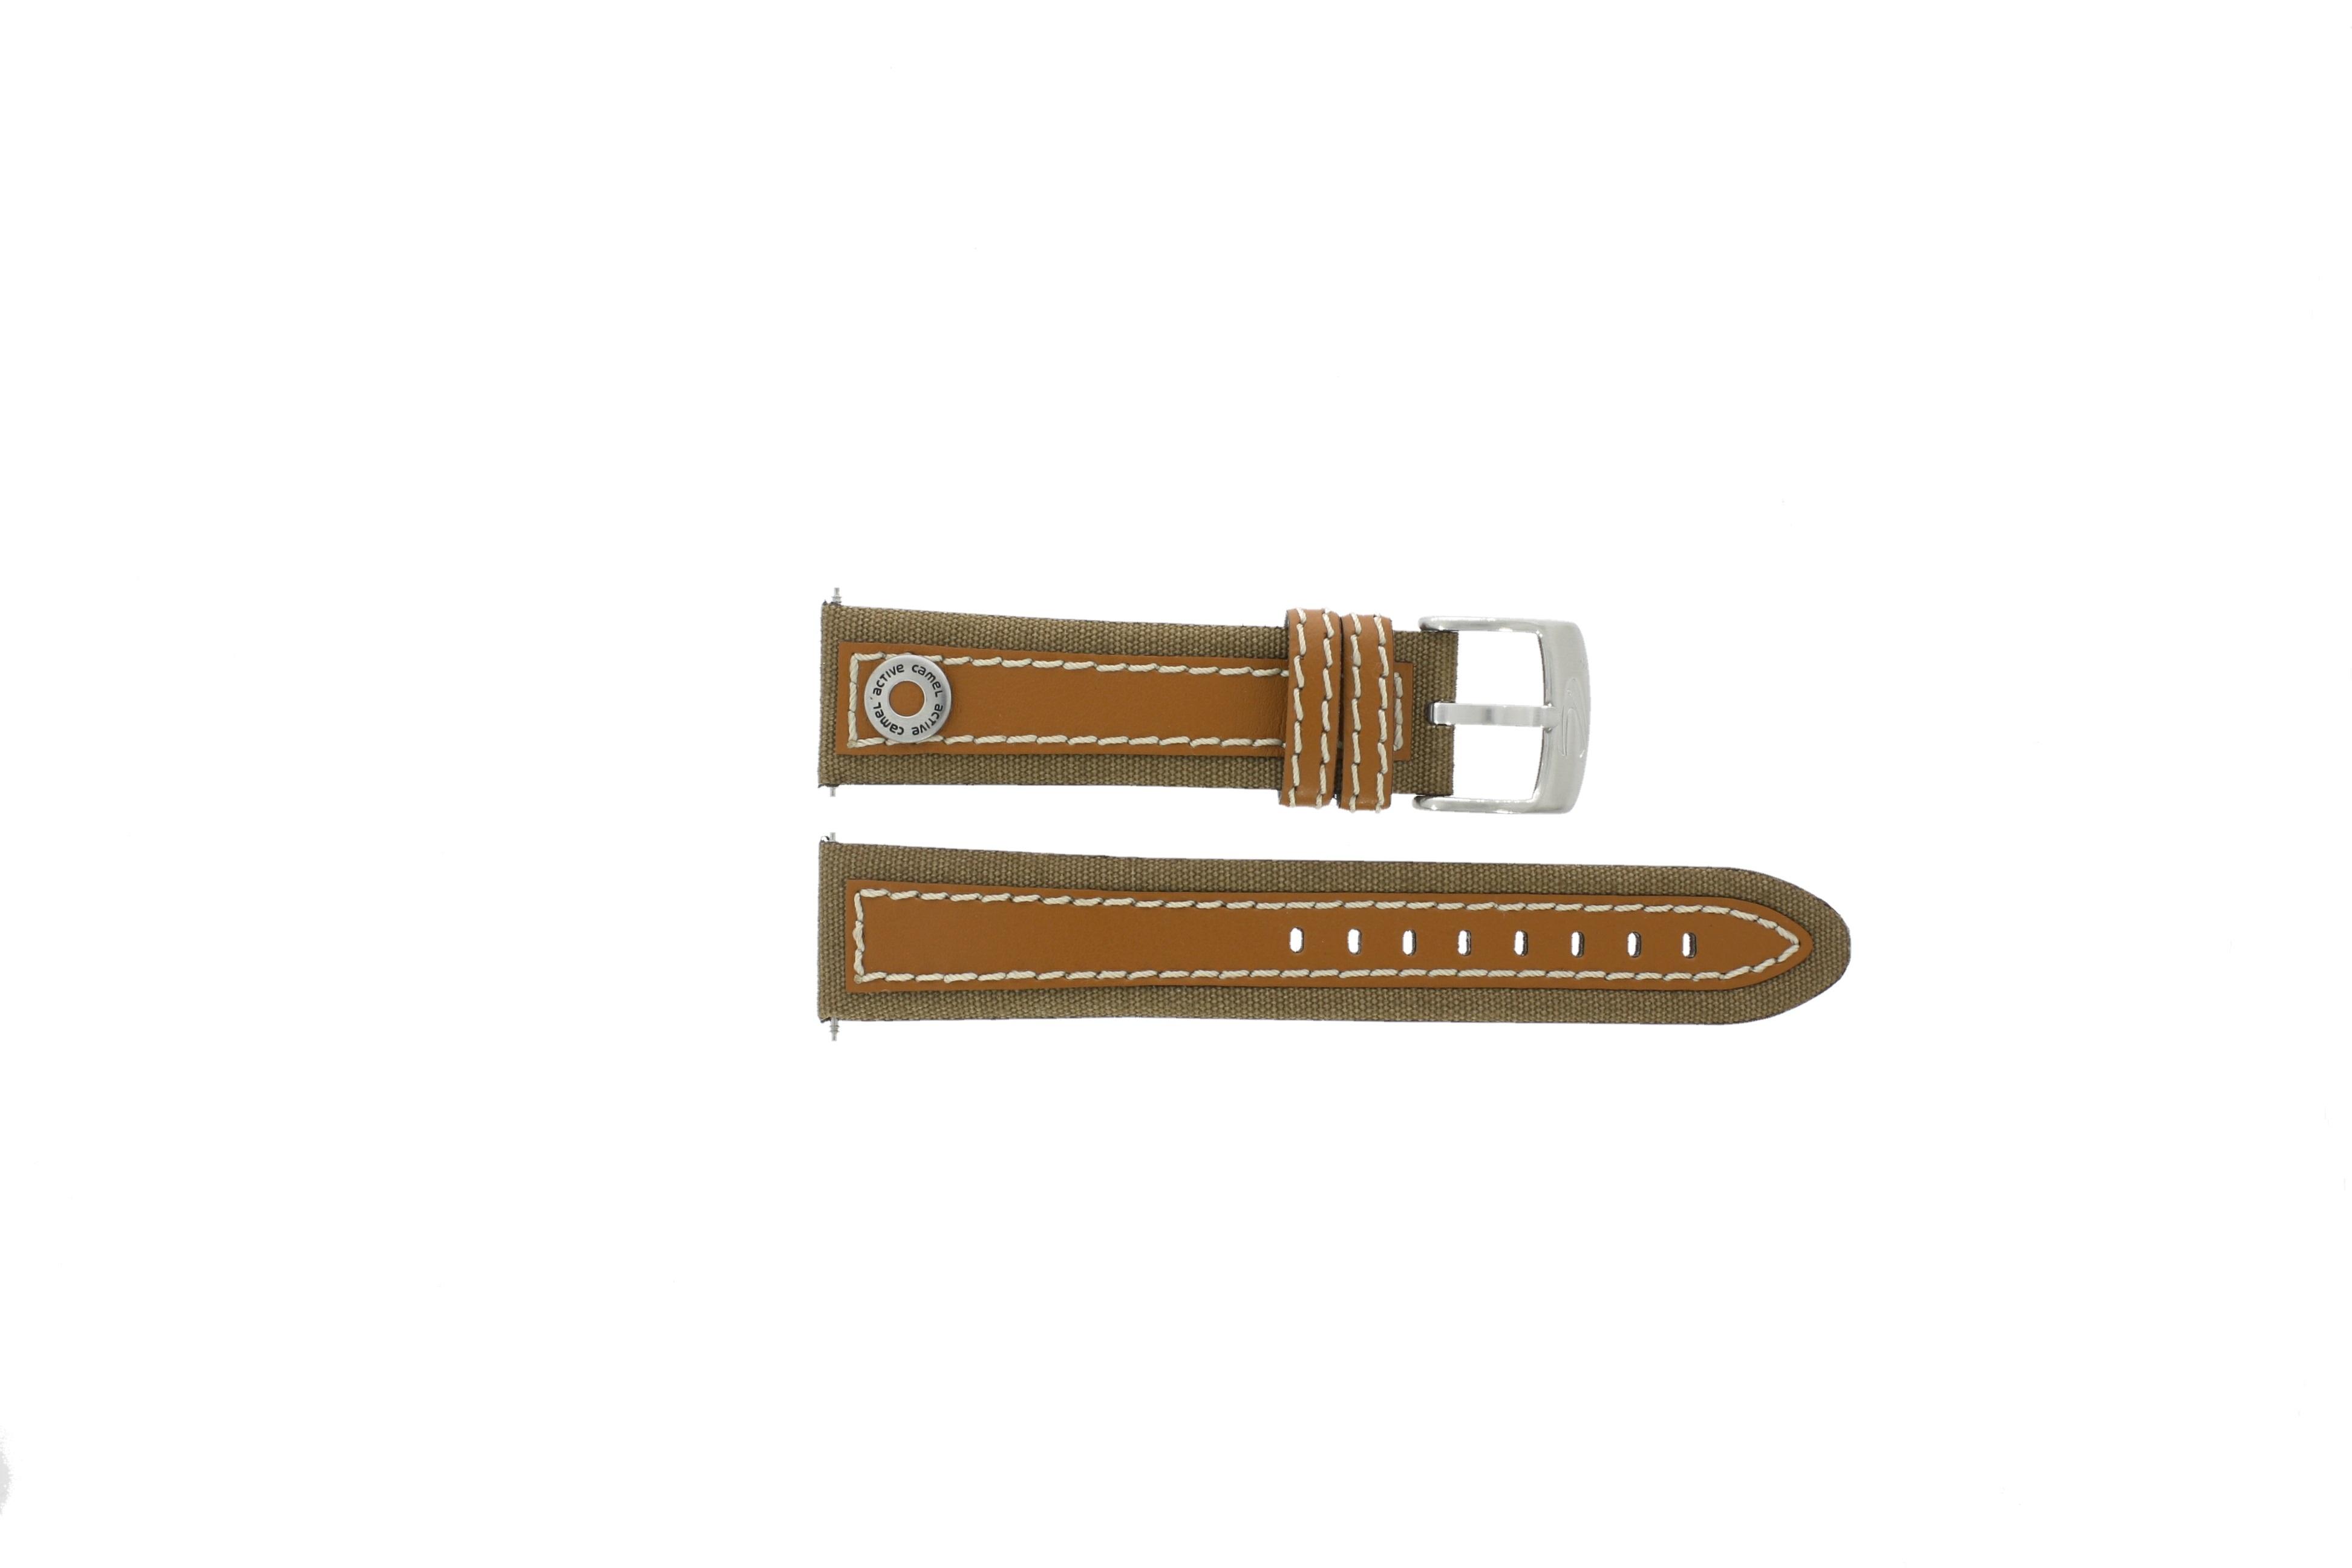 Camel horlogeband 3120-3129 / 3520-3529 Leder Bruin 22mm + bruin stiksel